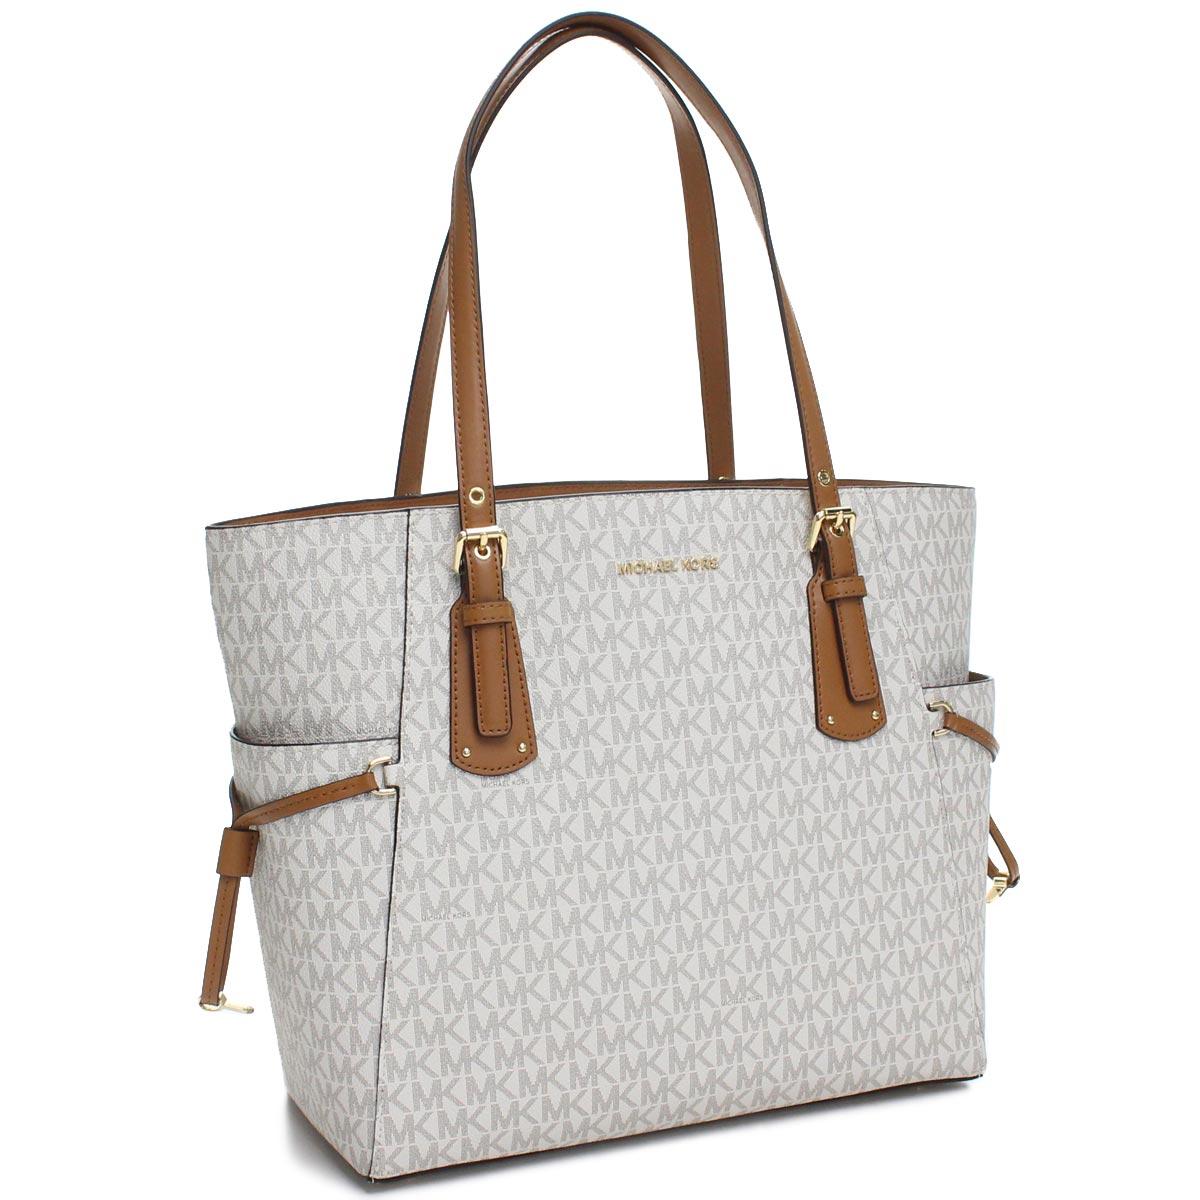 c519e423e46b3b Bighit The total brand wholesale: Michael Kors MICHAEL KORS VOYAGER tote bag  30T8GV6T4B 150 VANILLA white system | Rakuten Global Market